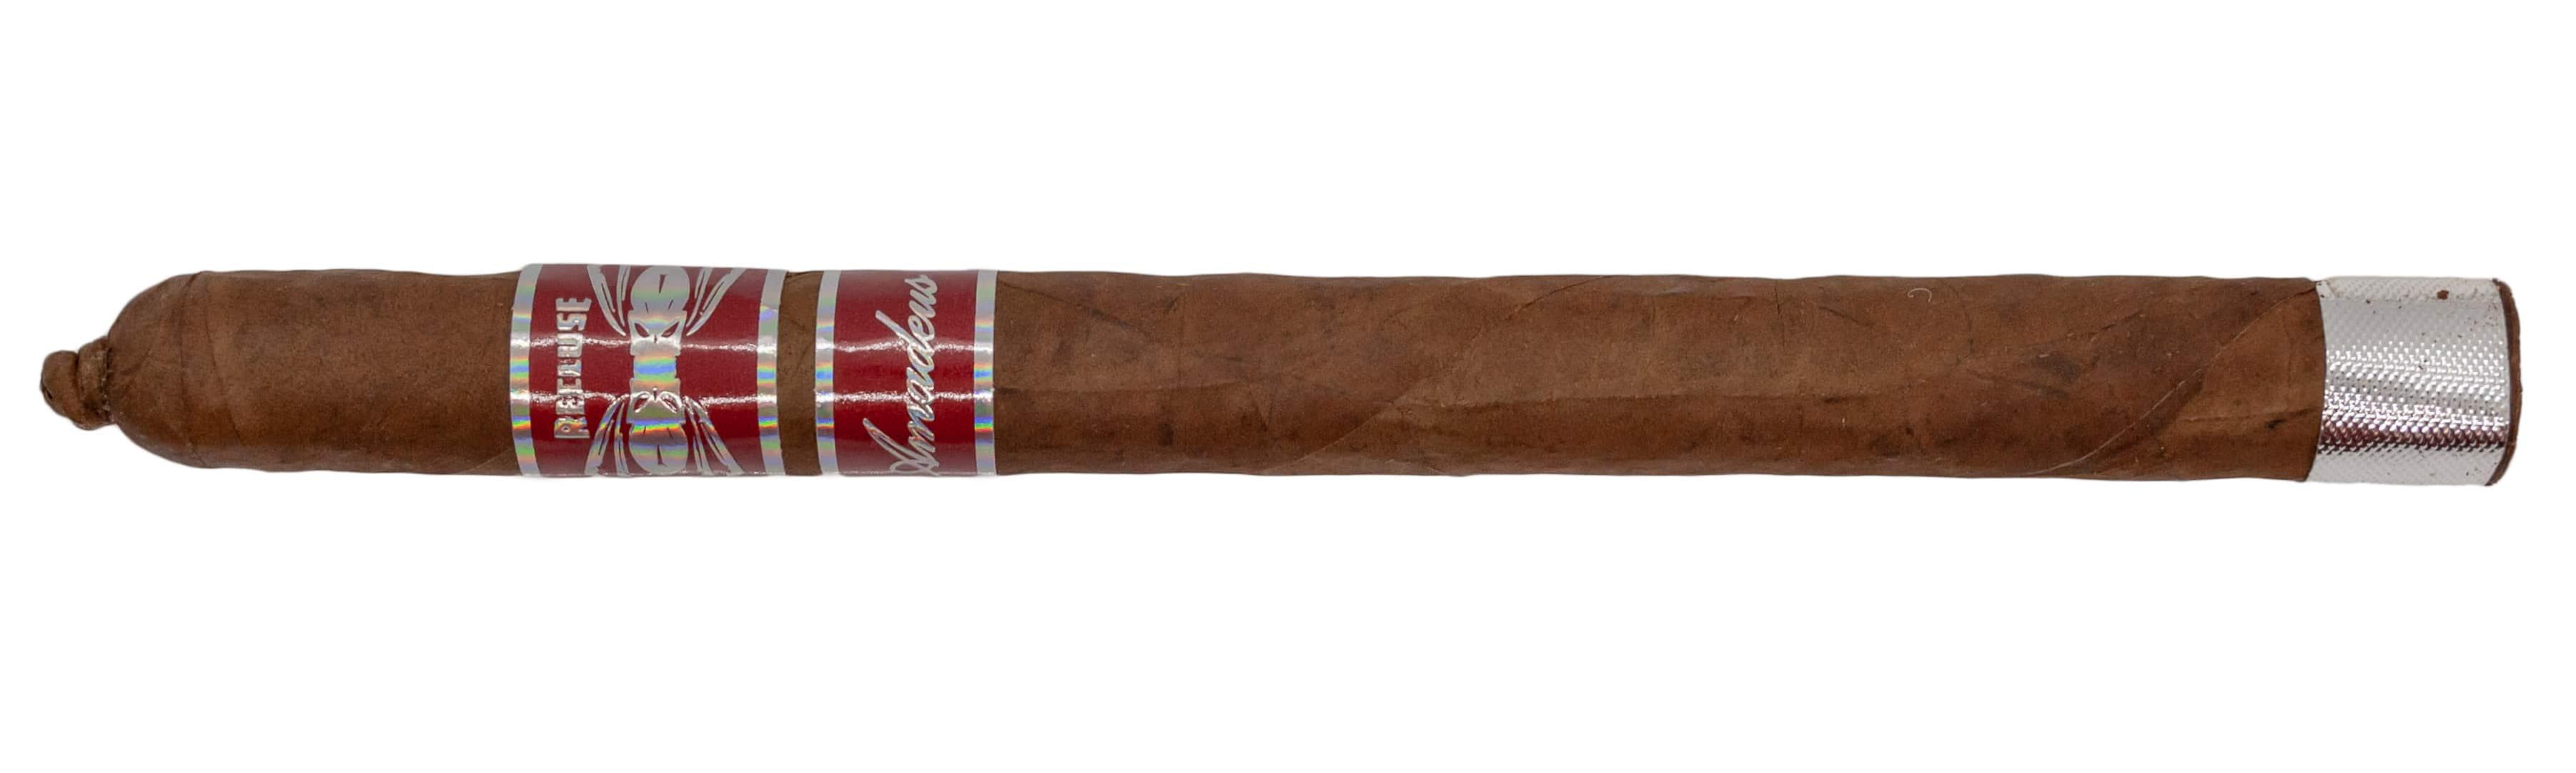 Blind Cigar Review: Iconic Leaf | Recluse Amadeus Habano Reserva Lancero